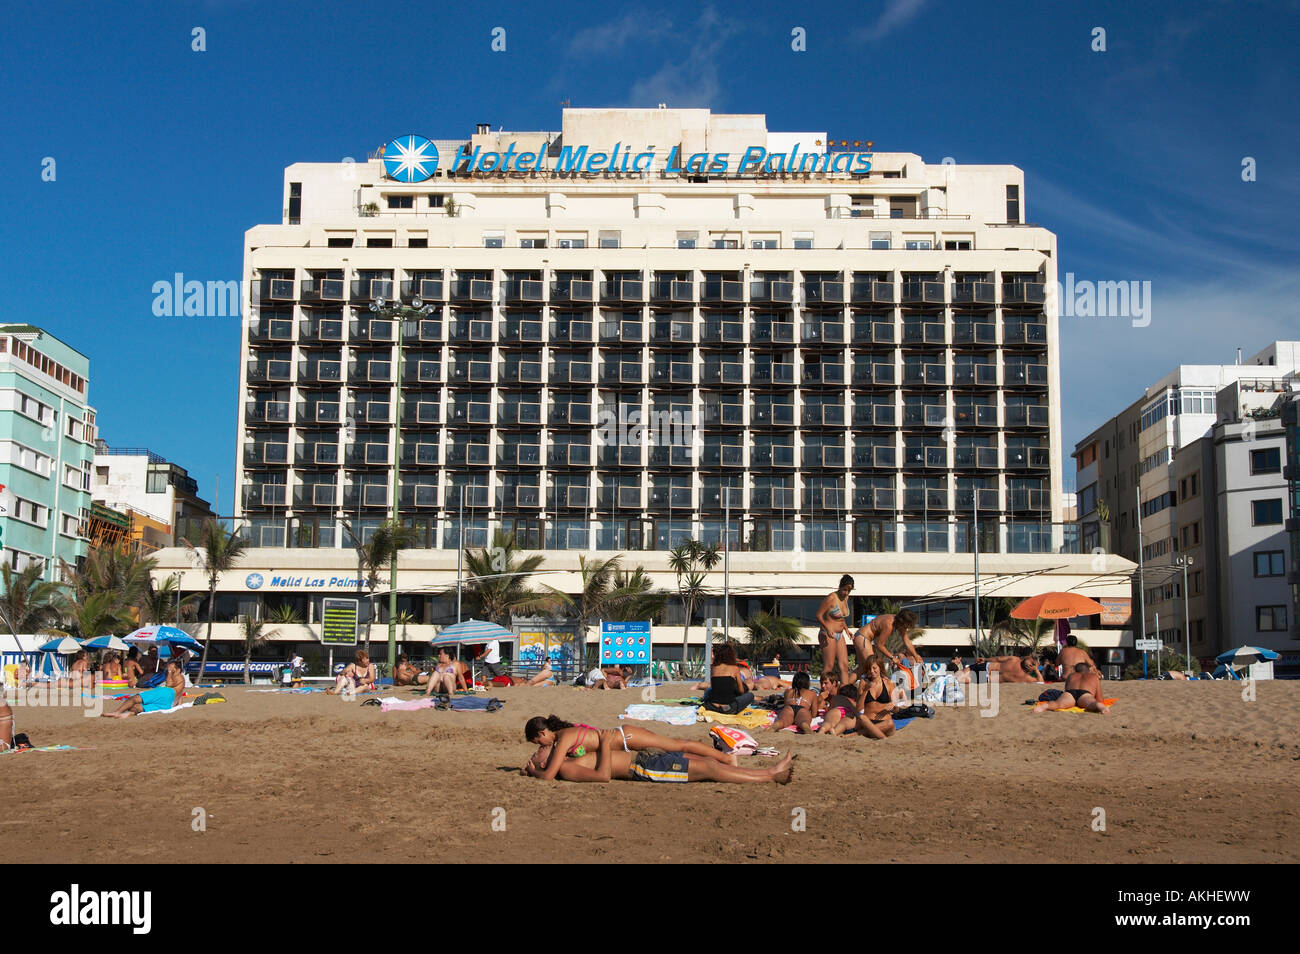 Junges Paar Küssen Am Strand Vor Hotel Melia Las Palmas In Playa De